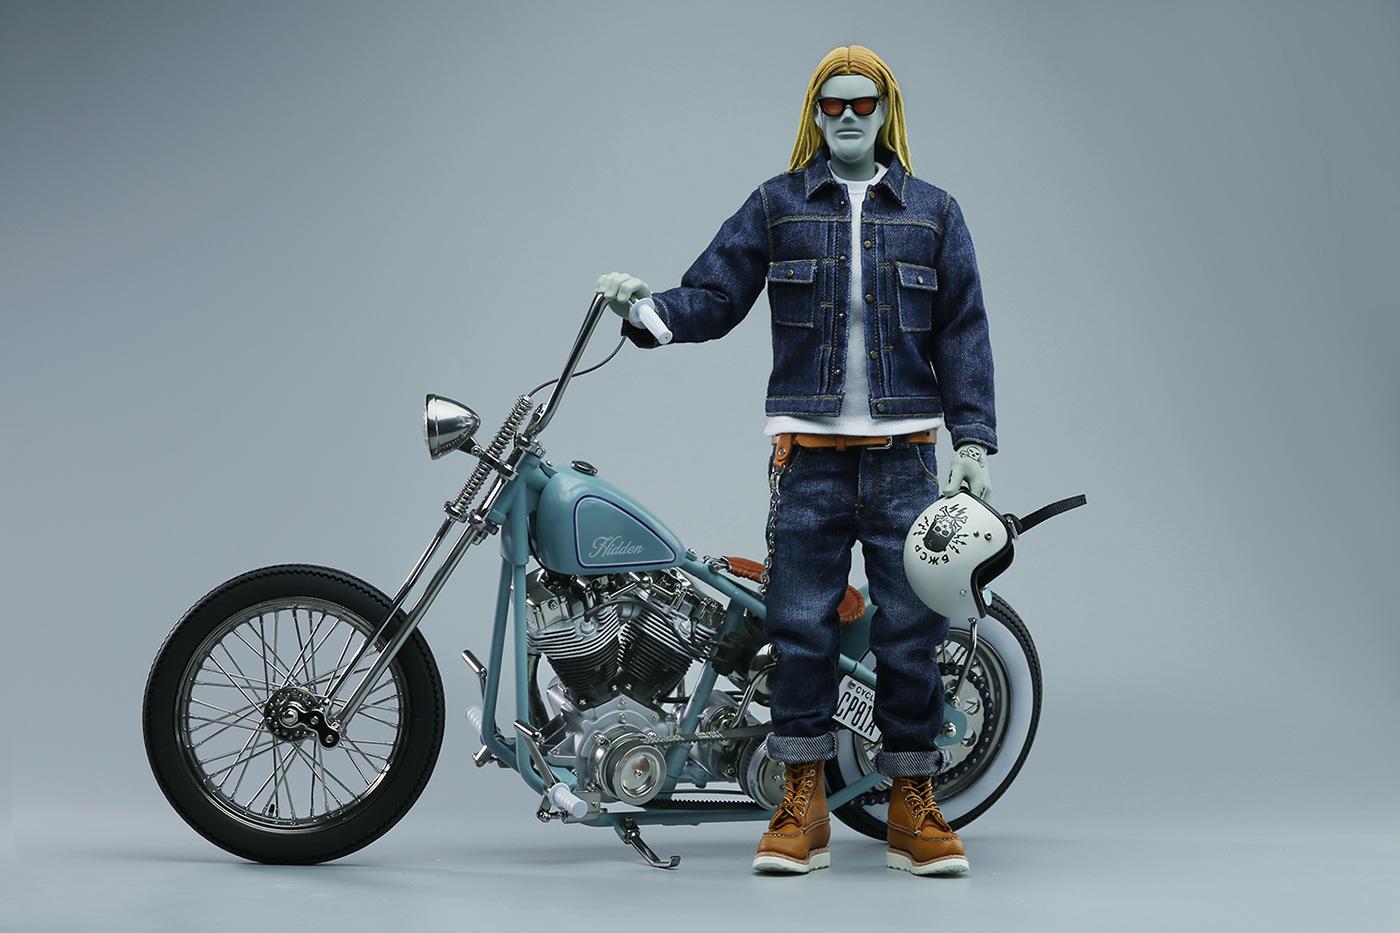 arttoy artwork biker Custom figure handcrafted handmade limited edition motorcycle vintage